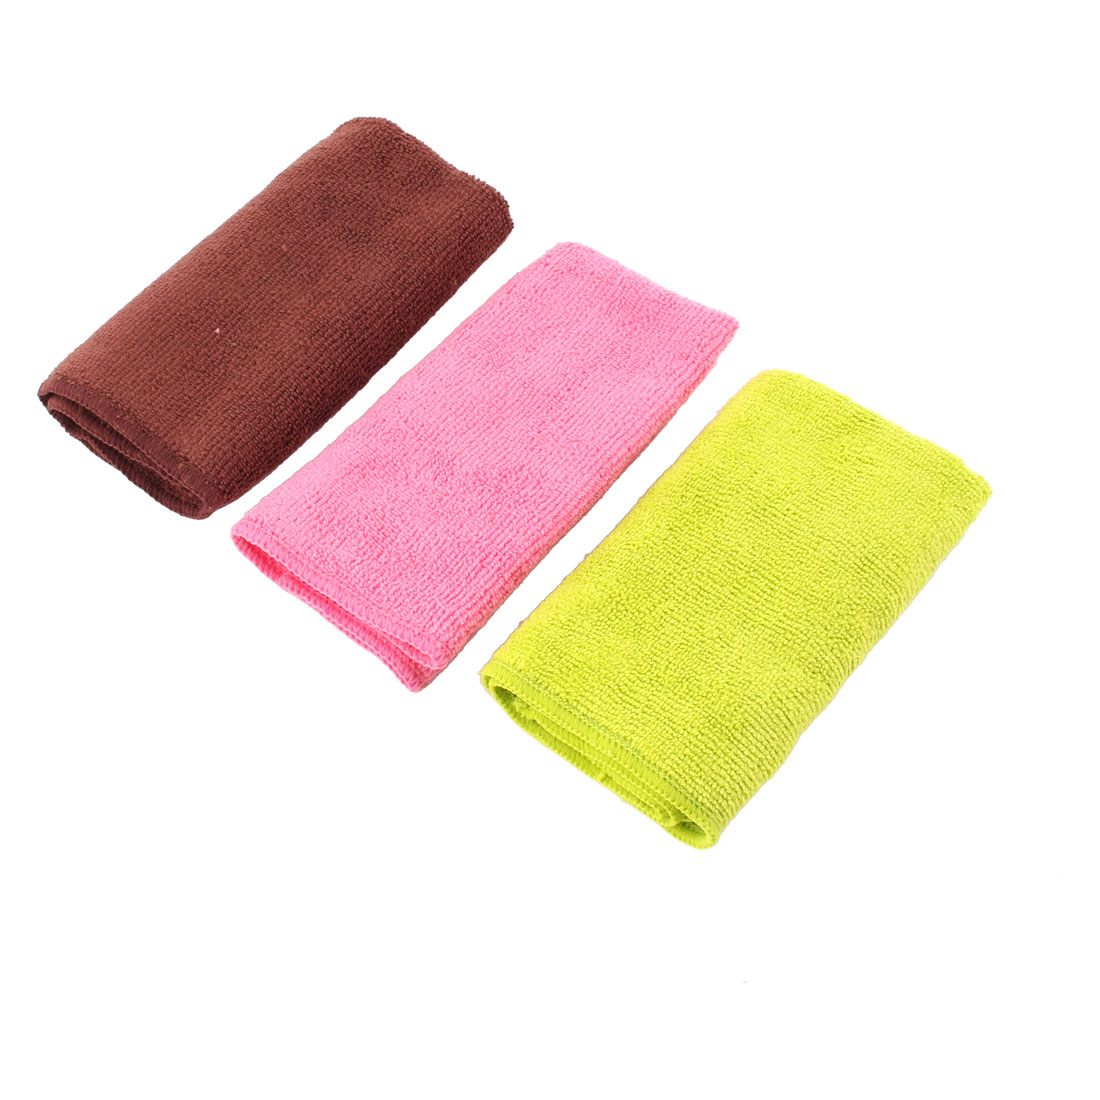 Household Kitchen Fibre Dish Cleaning Cloth Cleaner Tricolor 30cm x 30cm 3 Pcs